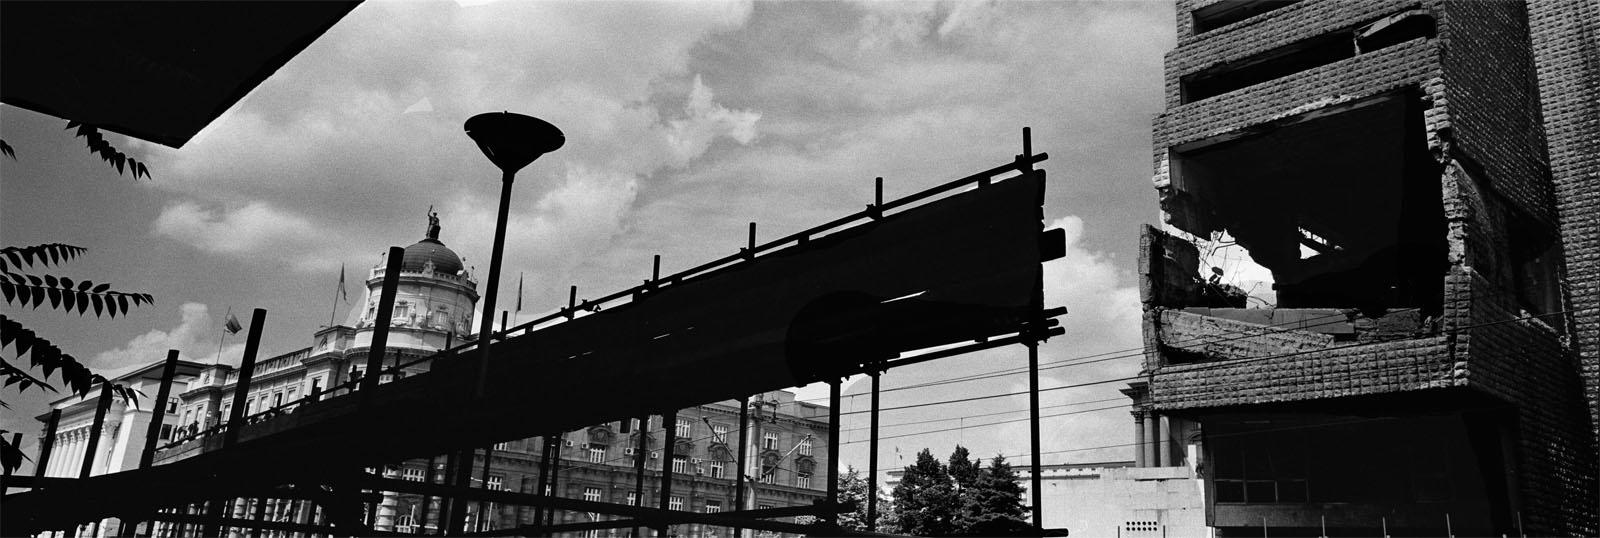 Art and Documentary Photography - Loading BGD___Fabio_Sgroi_016.jpg